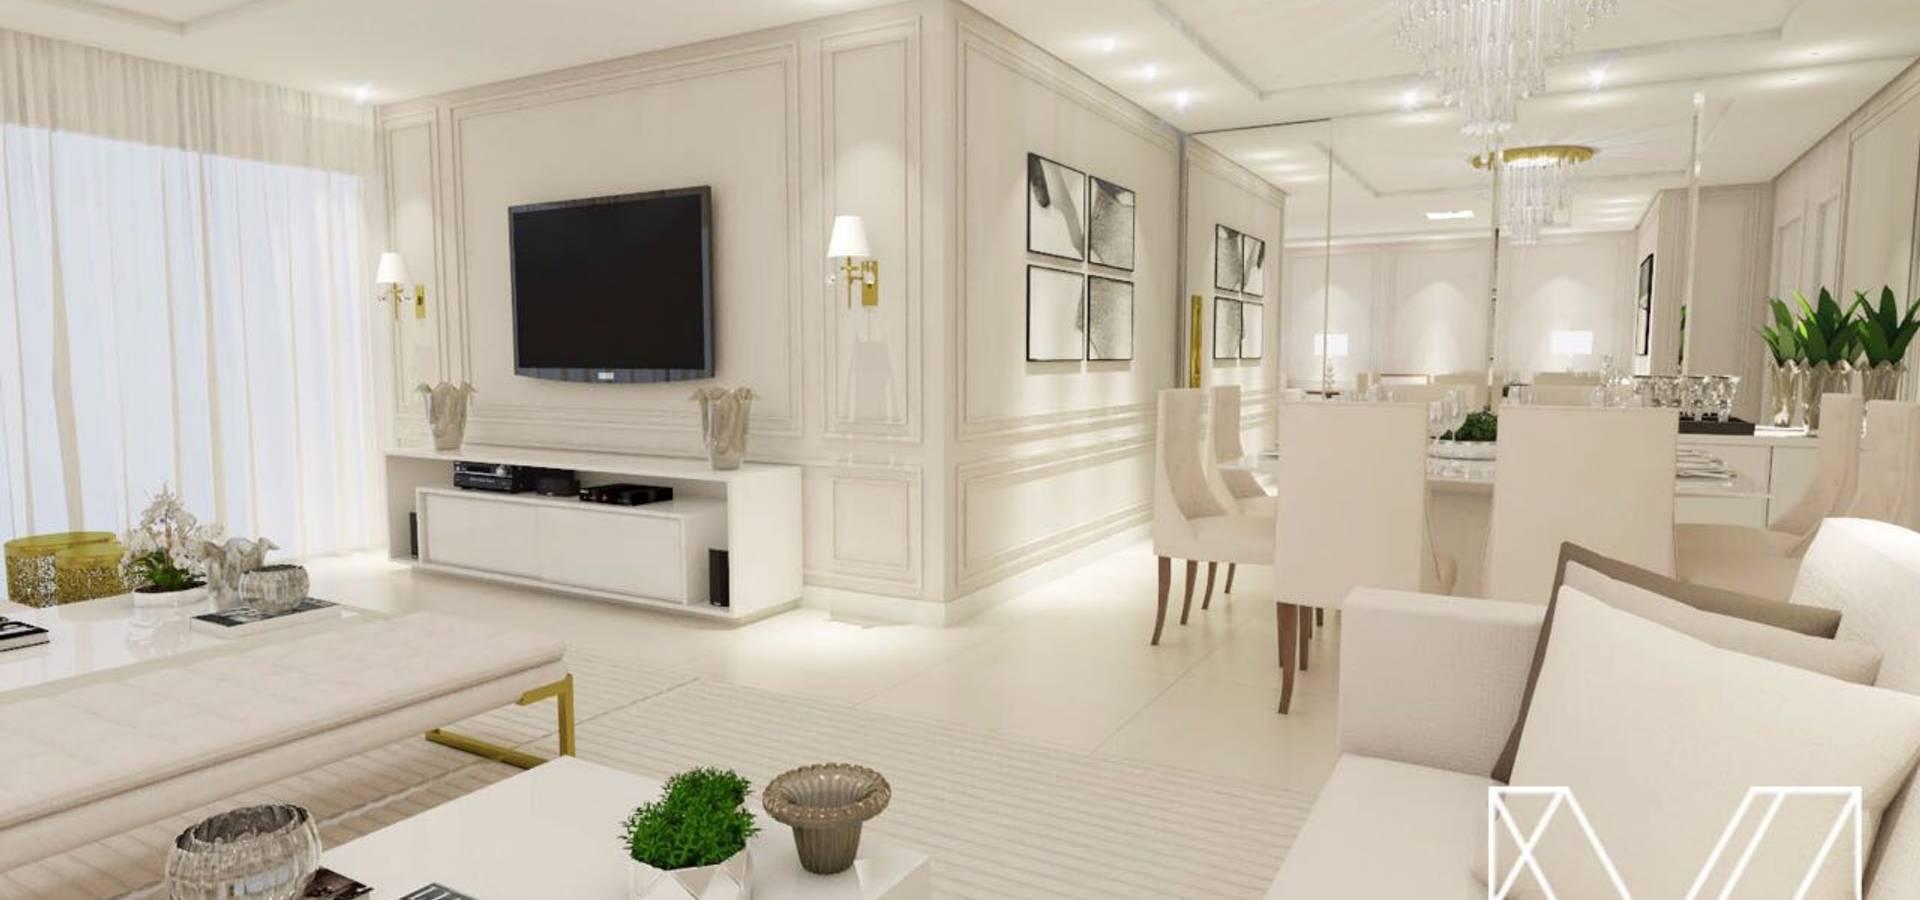 Manu Vasconcelos Arquitetura + Interiores